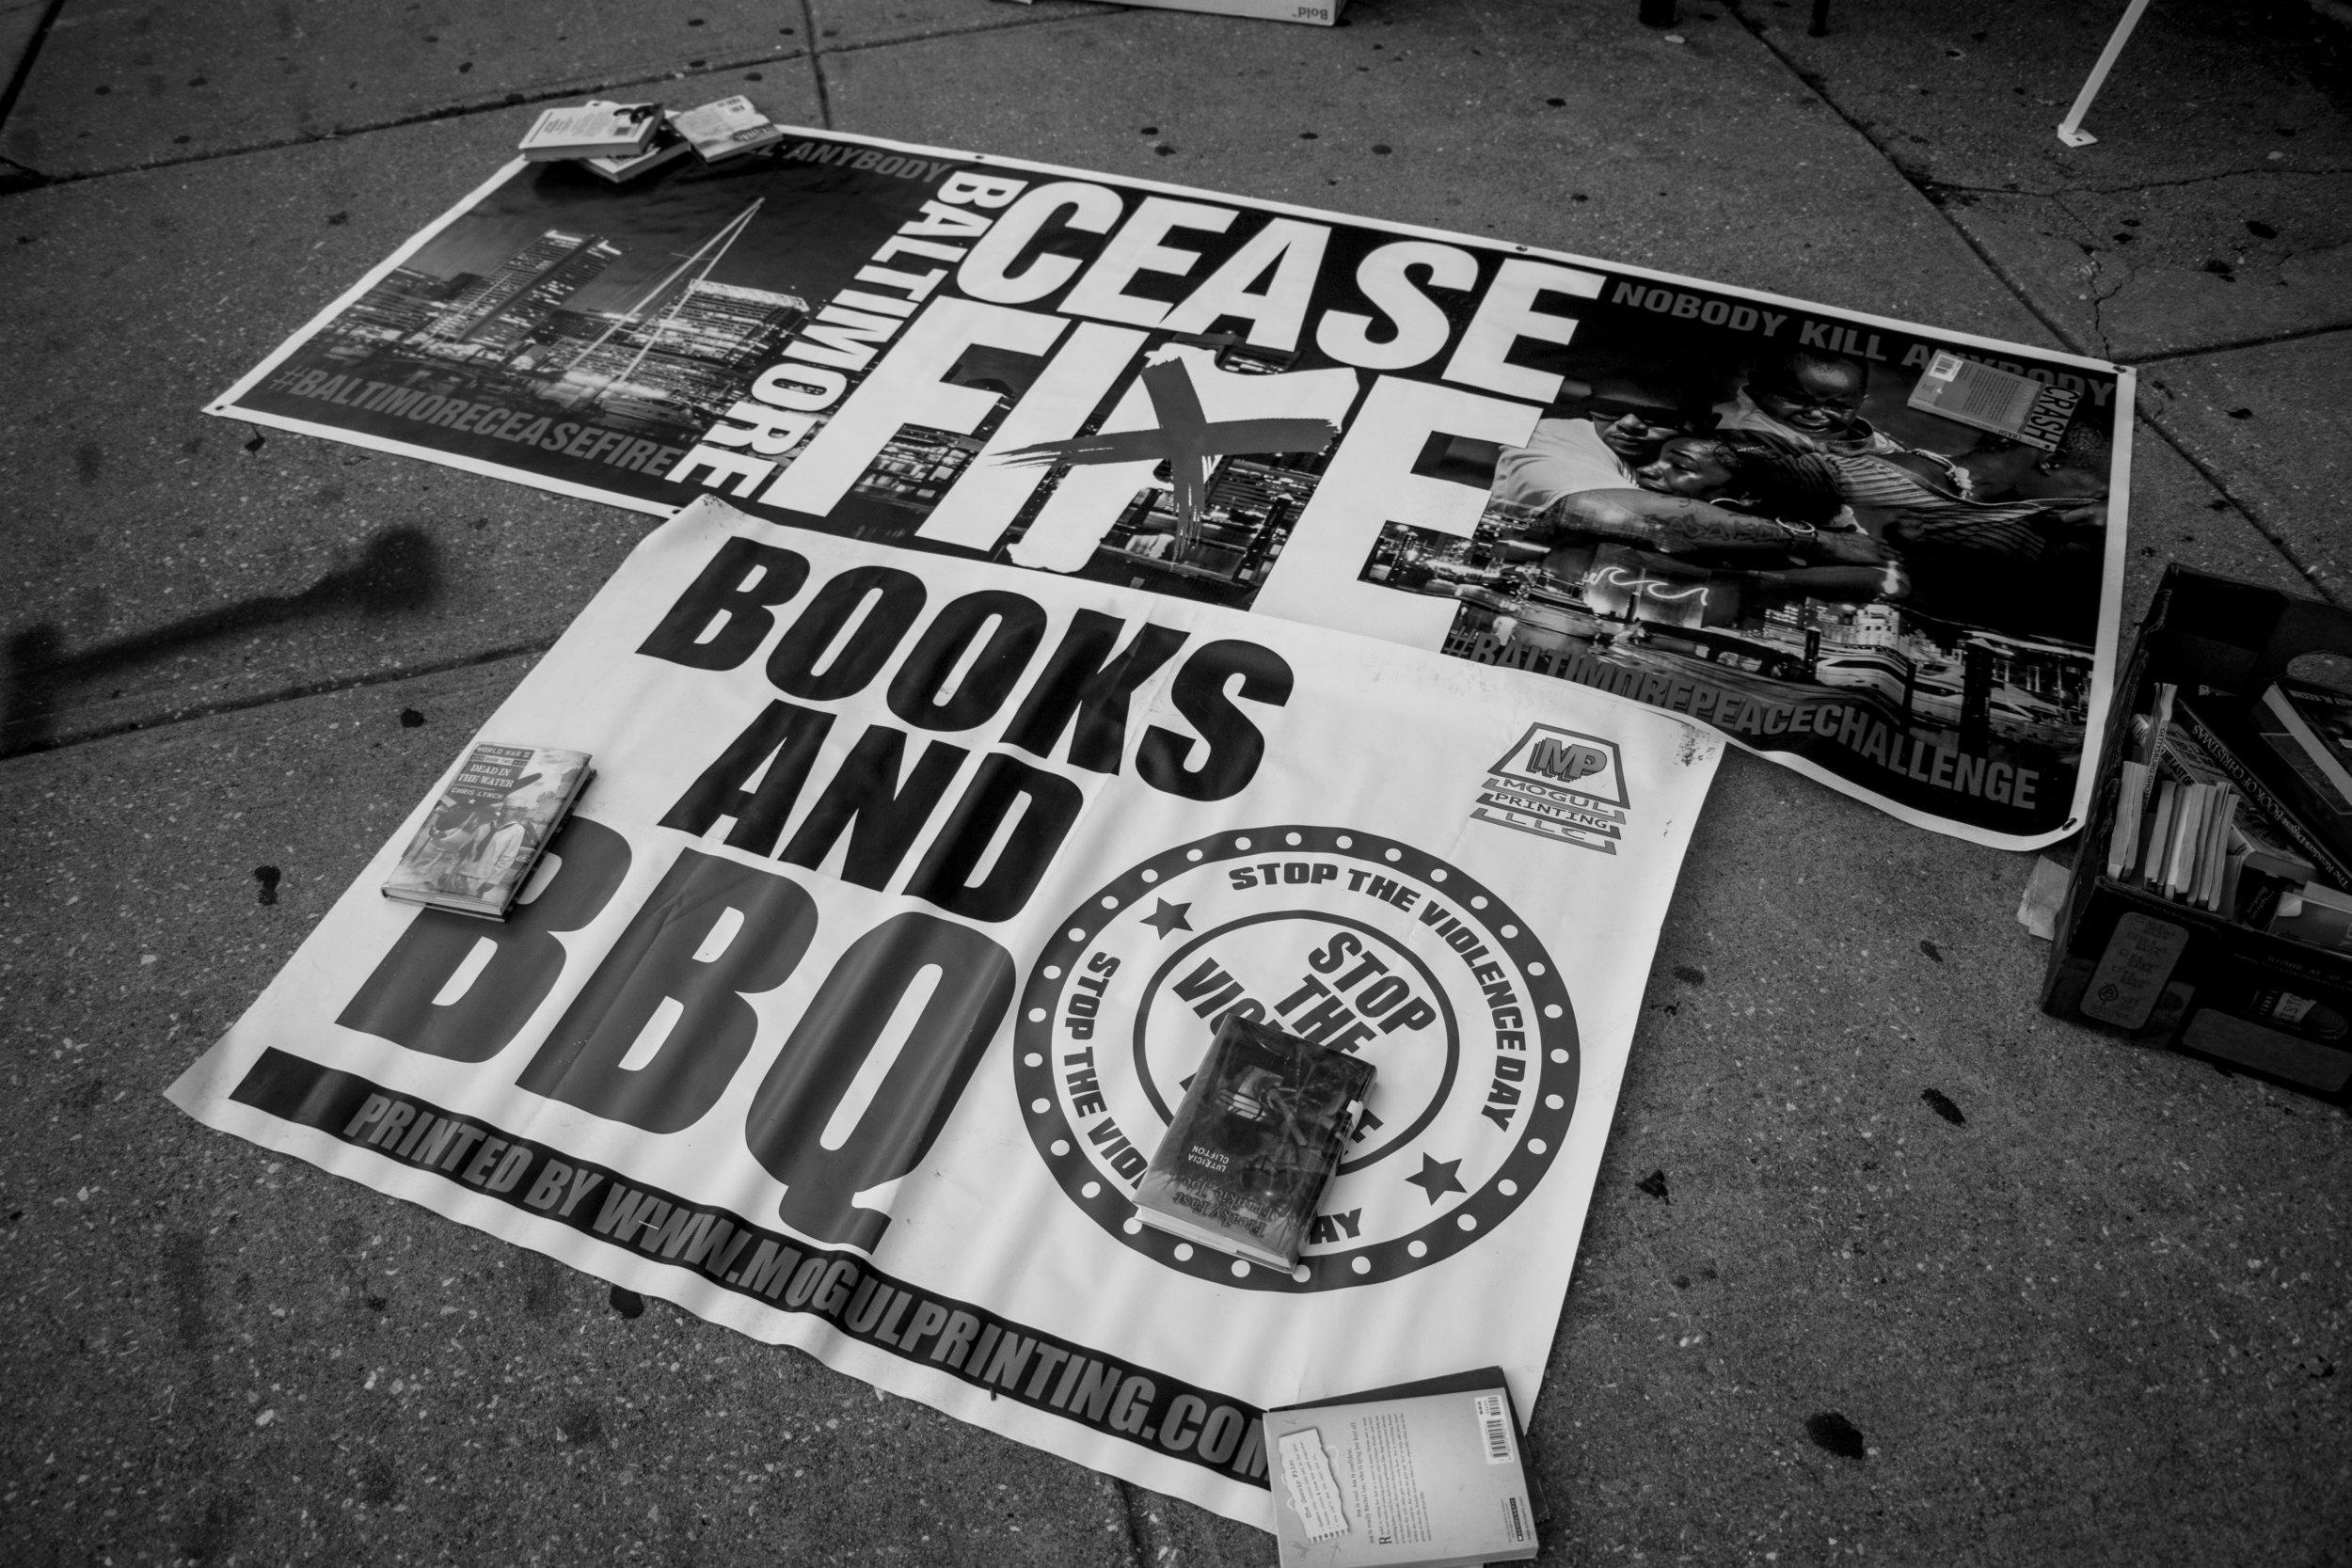 BaltimoreCeasefire2017_Lai_007.JPG